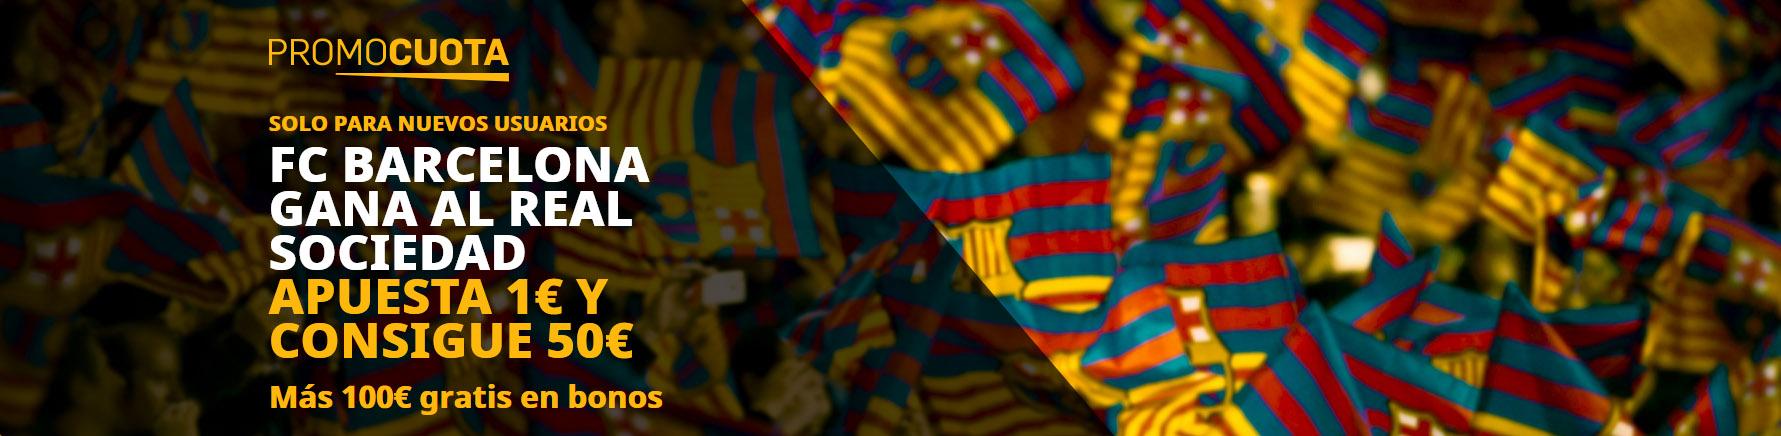 Barcelona gana Real Sociedad